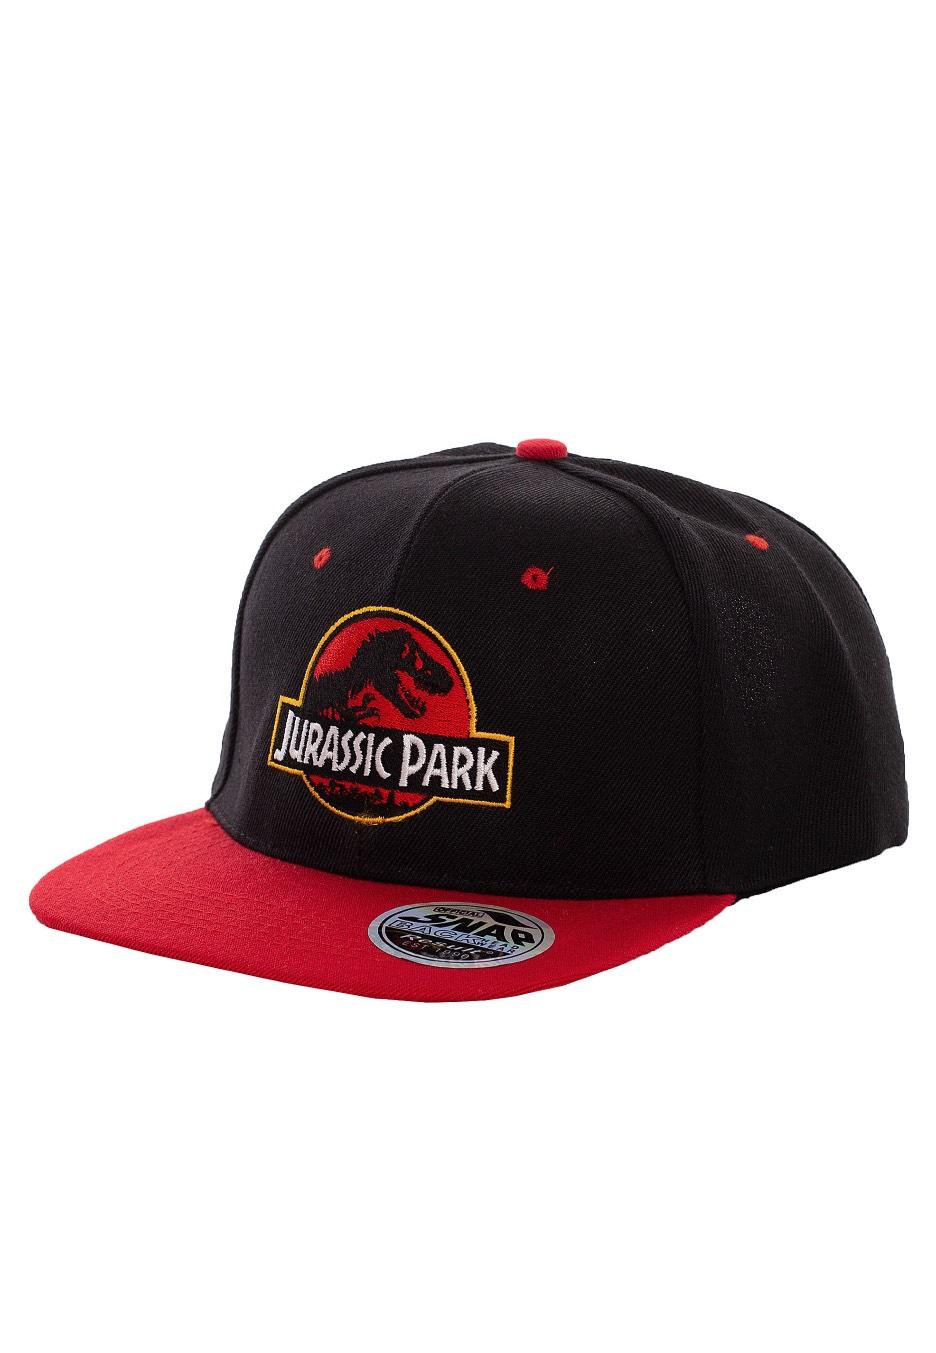 Jurassic Park Logo Black Red Cap Impericon Com Us